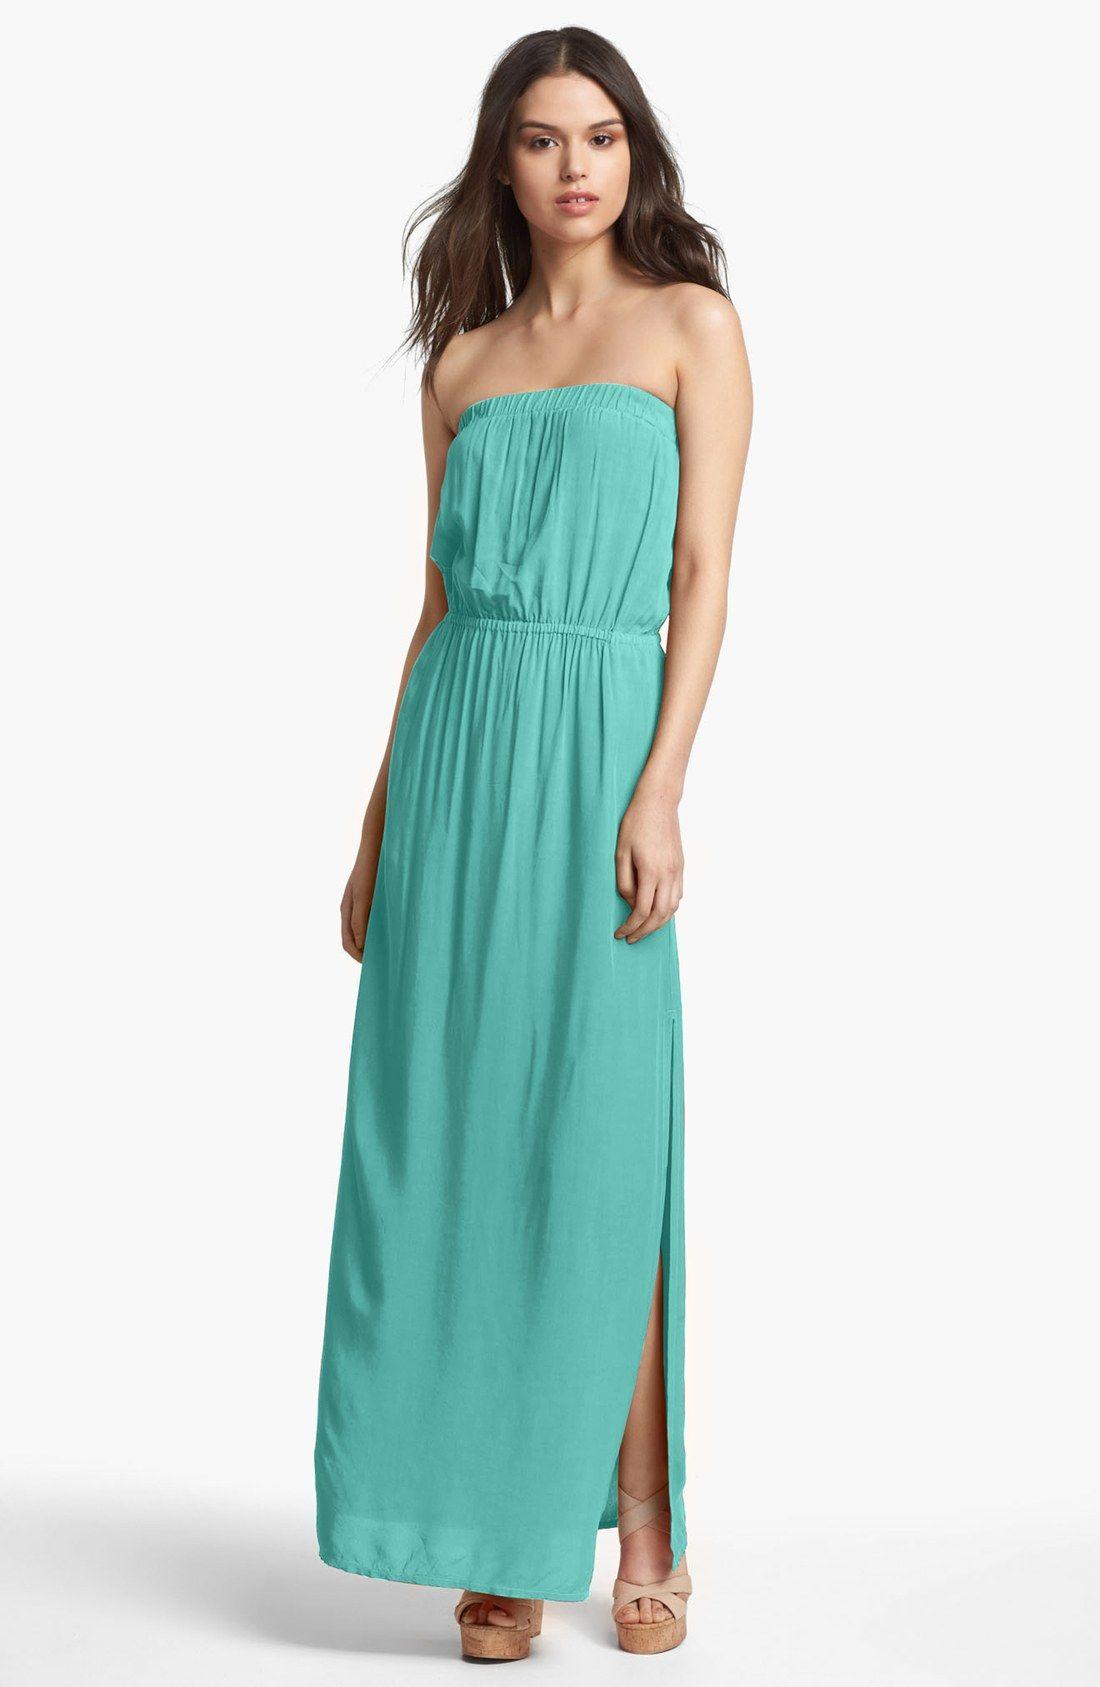 strapless-maxi-dress- | Straplees Maxi Dress | Pinterest | More ...